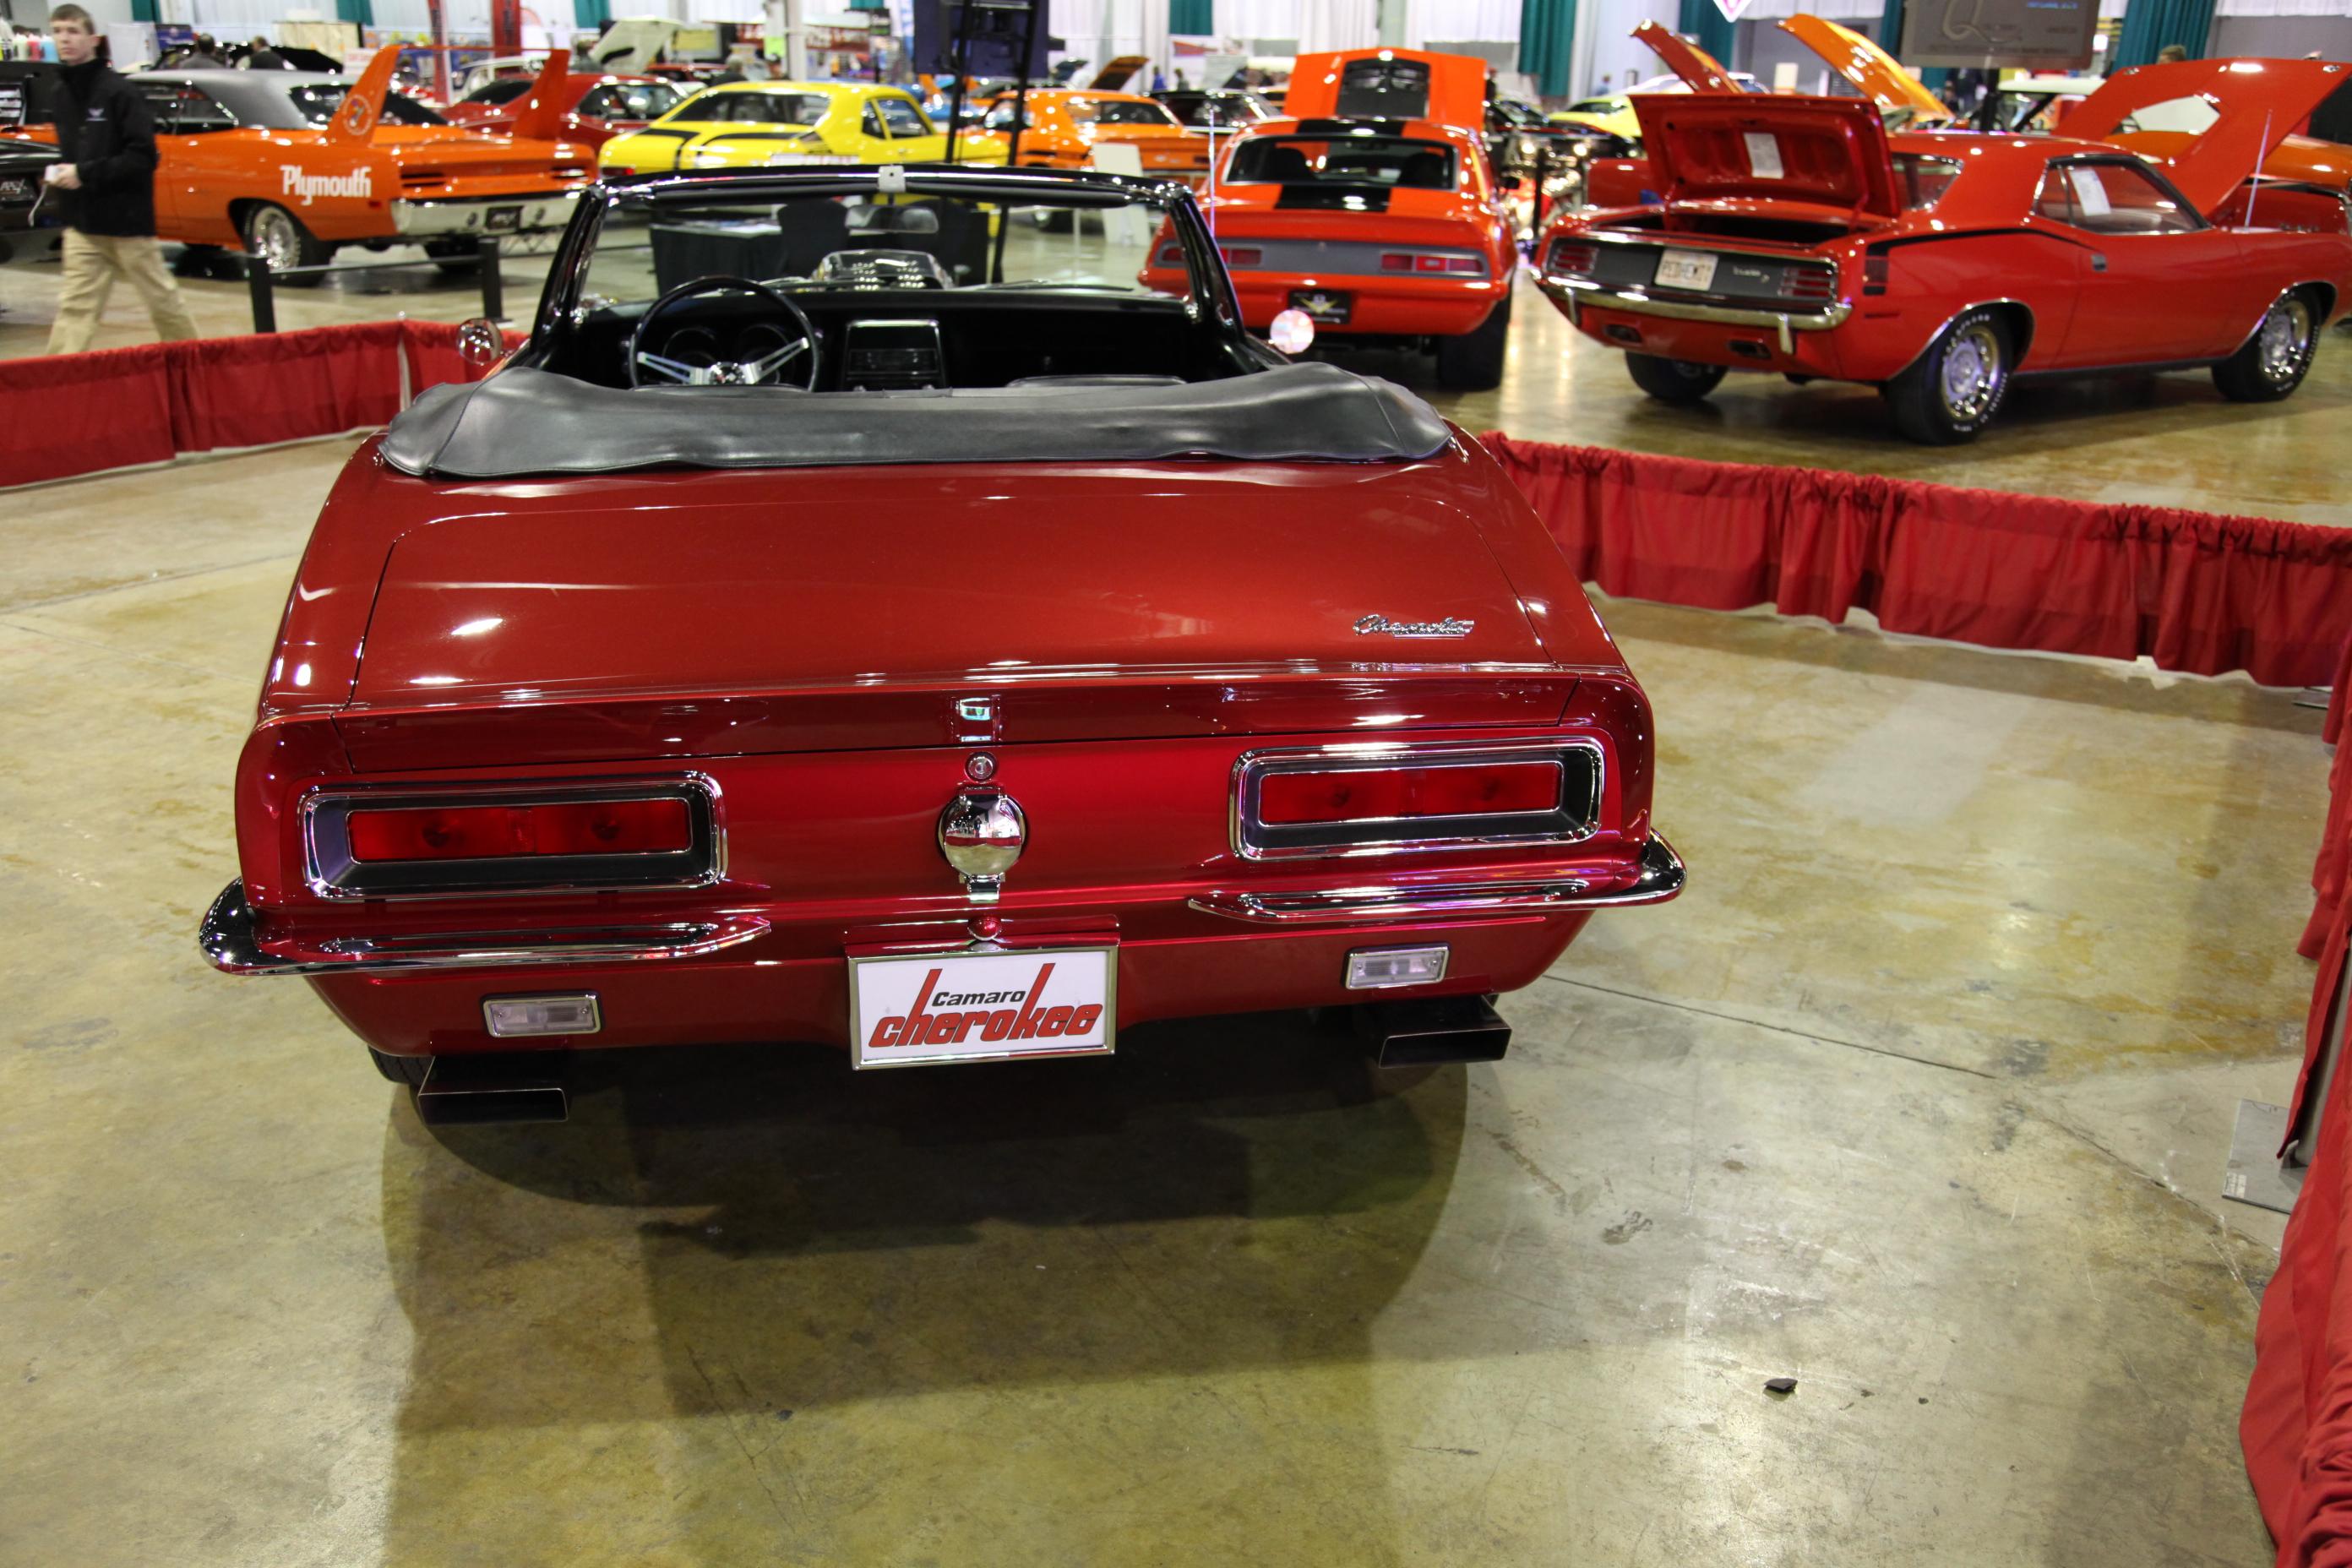 1967 Chevrolet Camaro Cherokee, rare custom Camaro